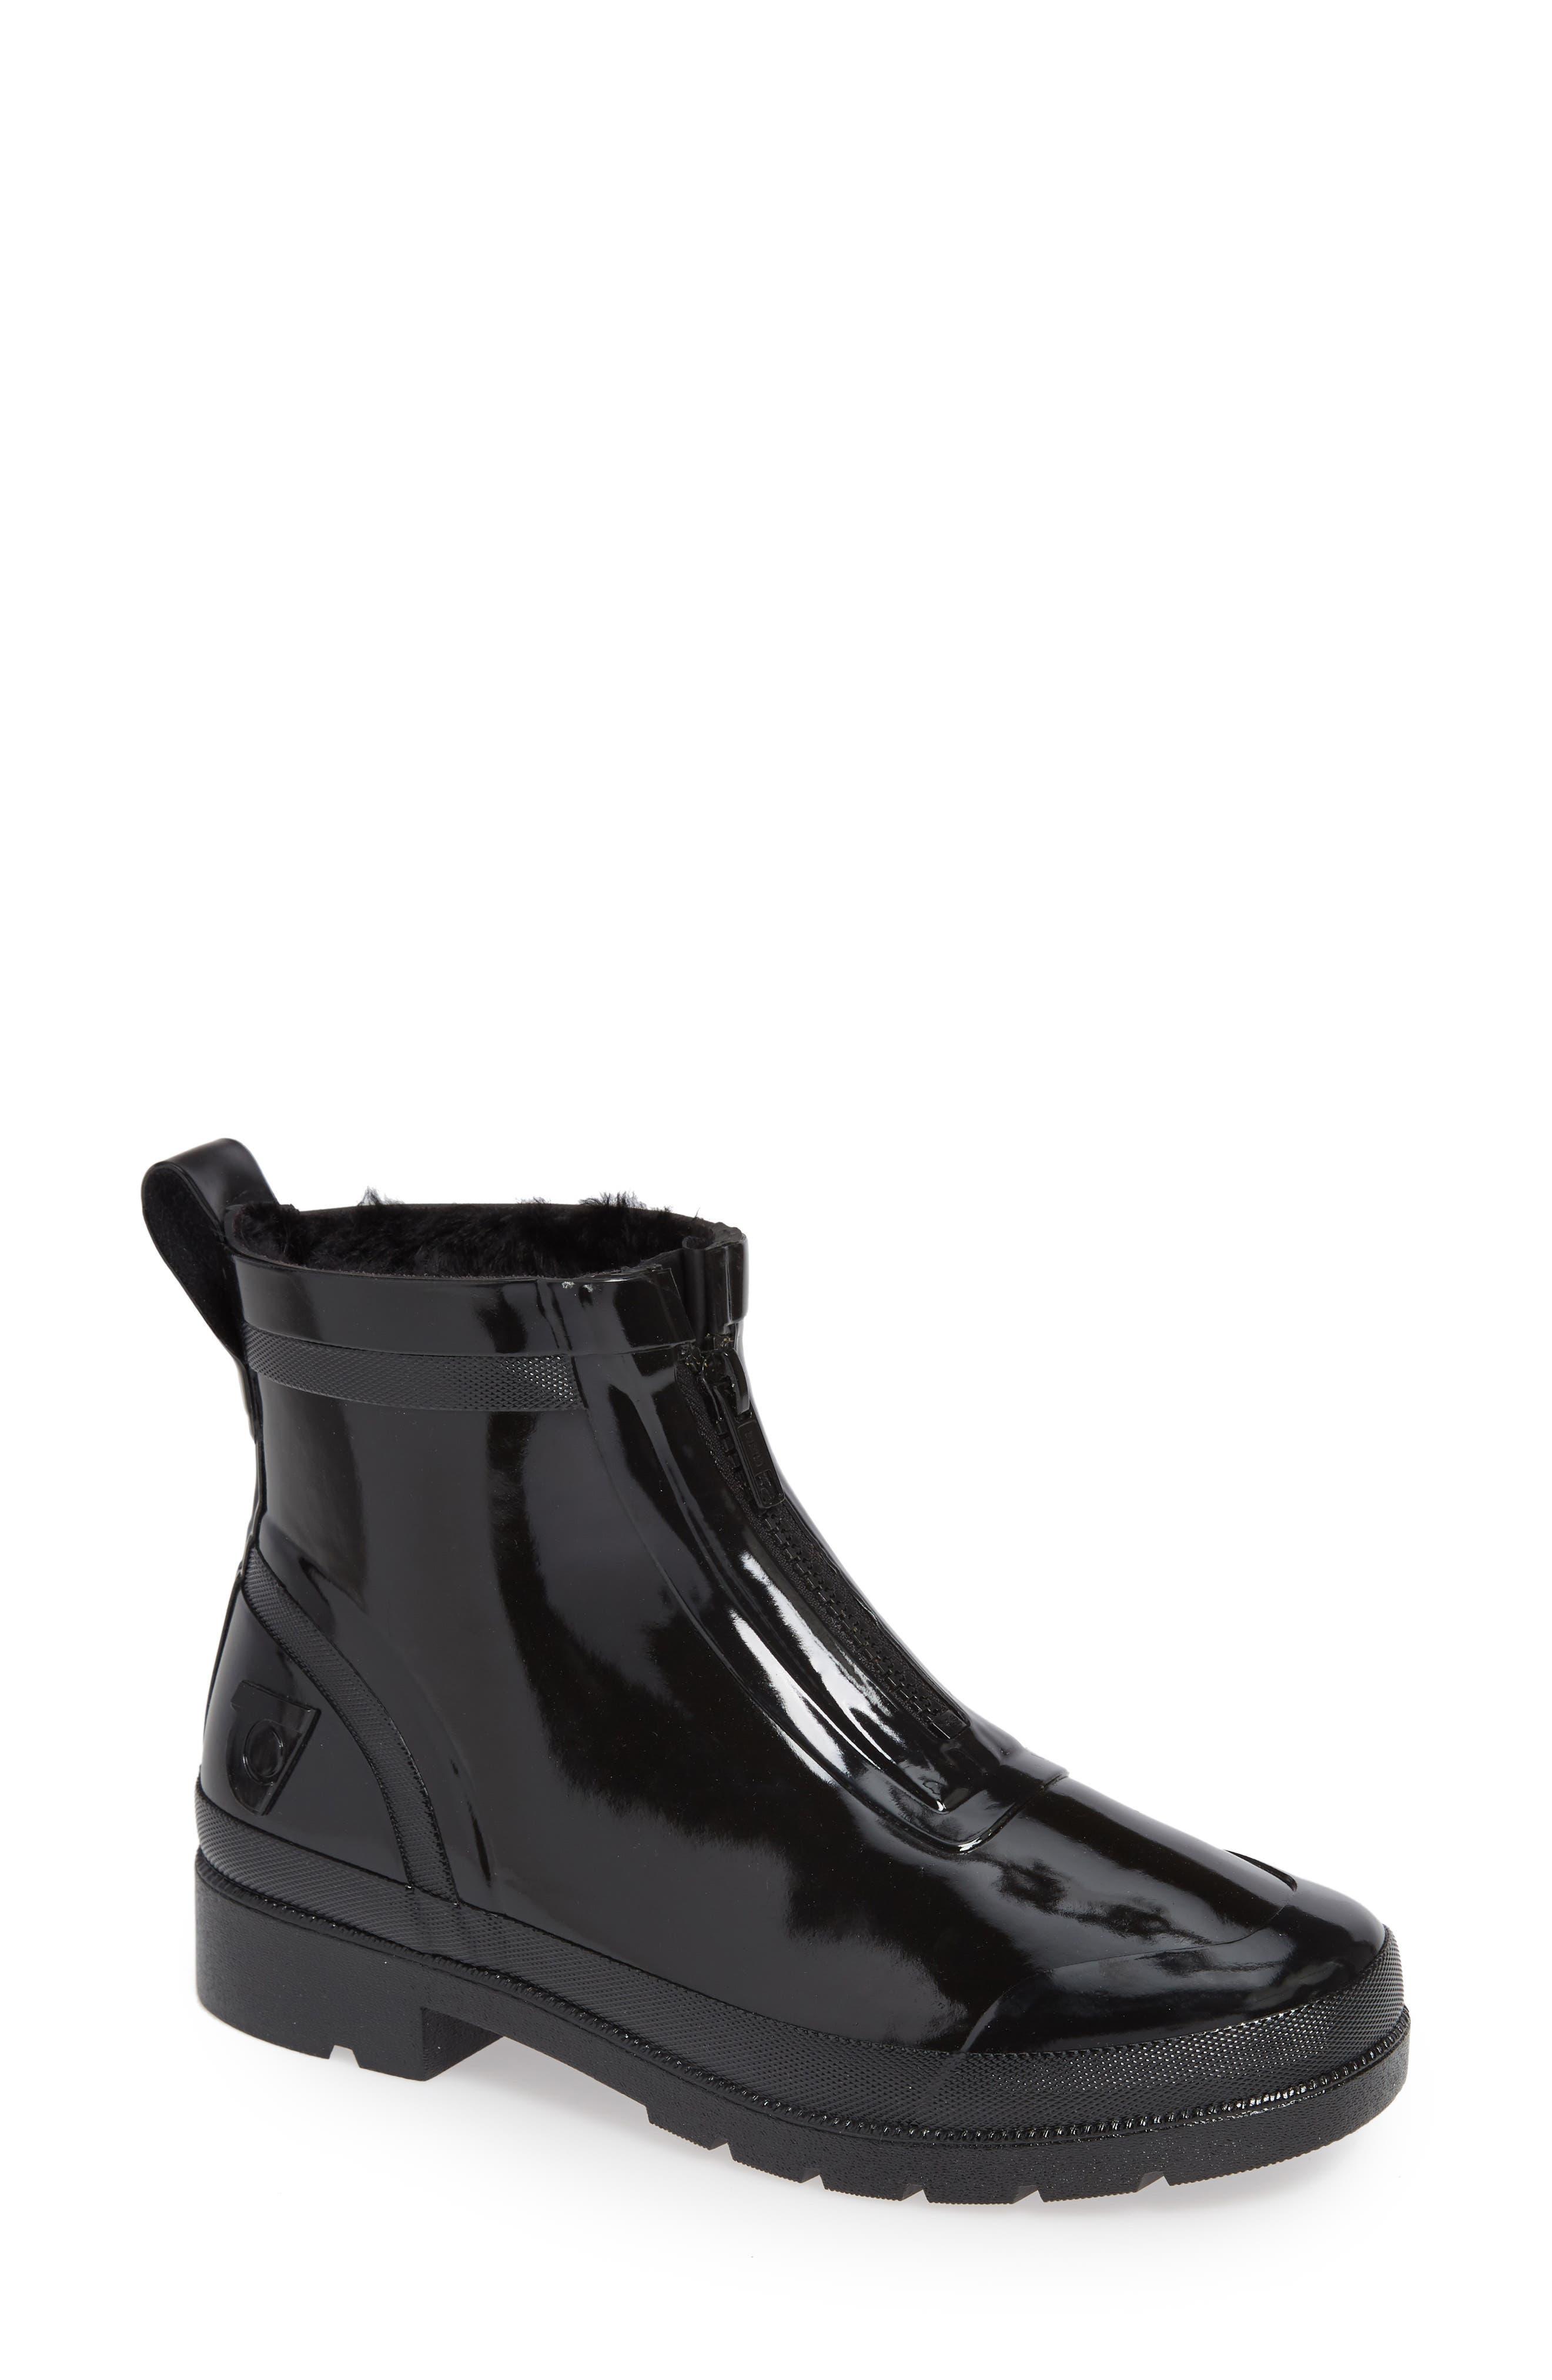 TRETORN Lina Zip Short Shiny Rubber Rain Boots in Black